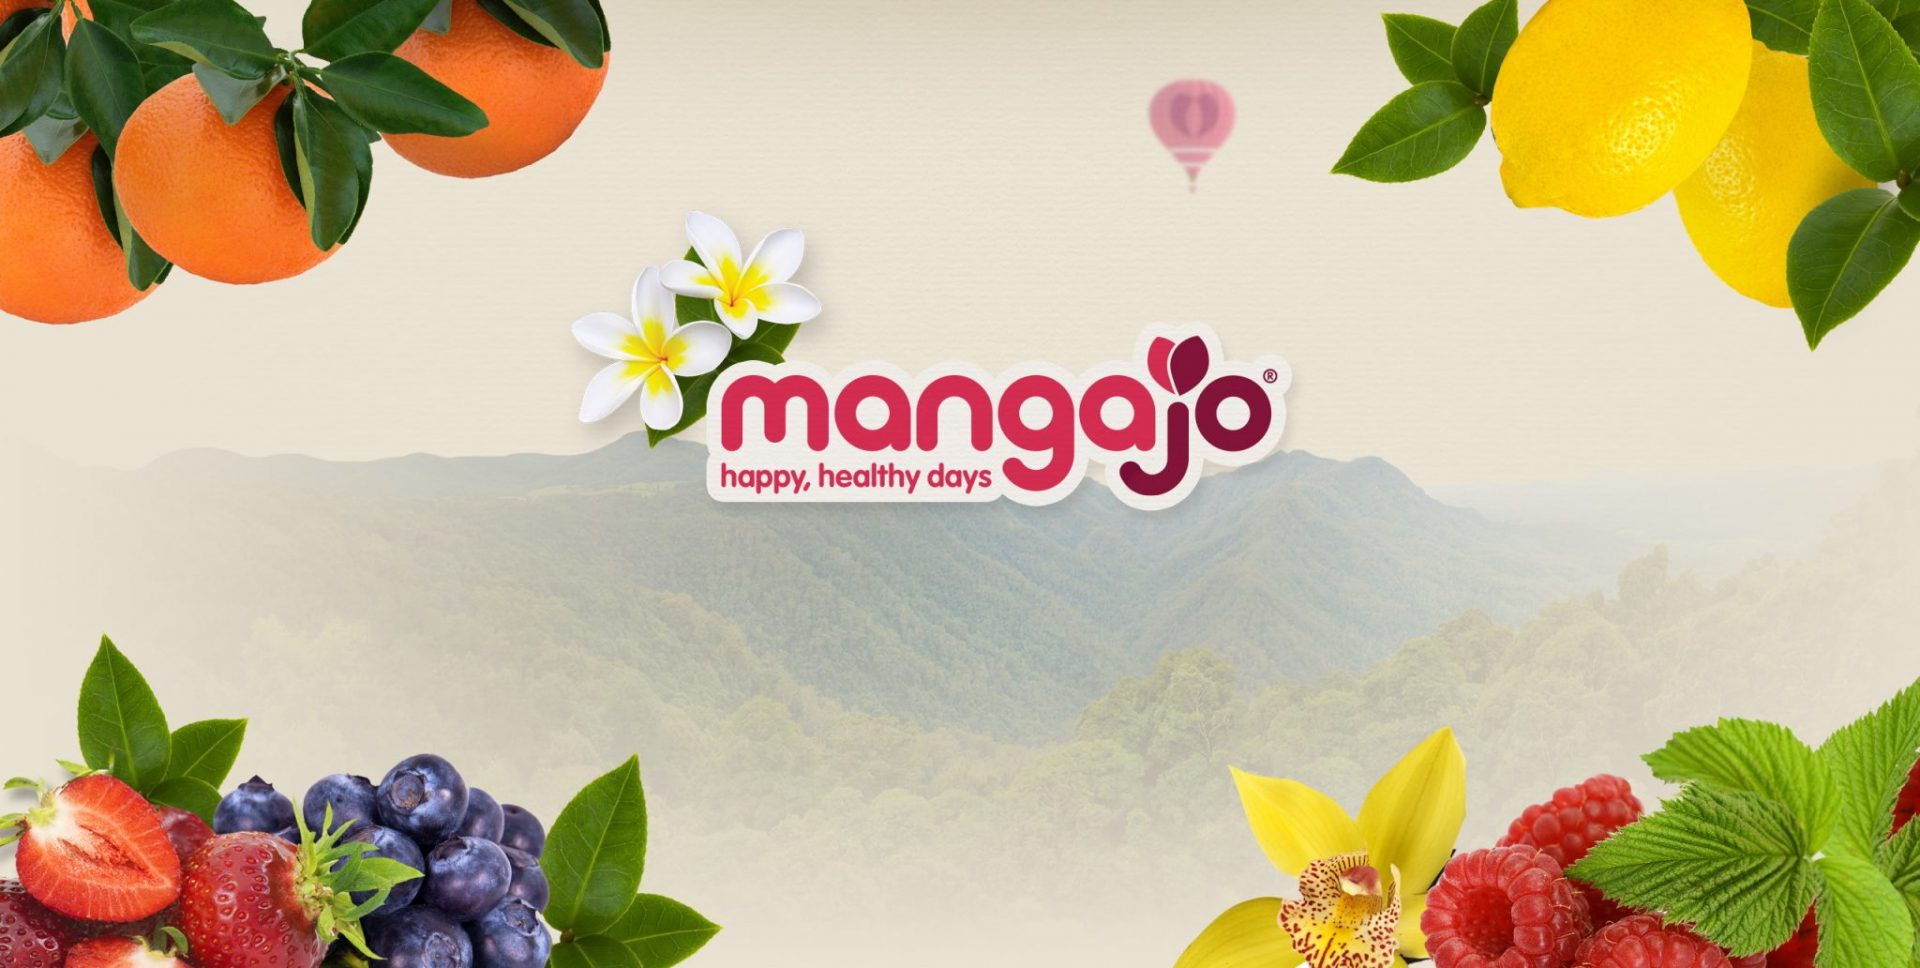 Mangajo-Landscape-header-2560-x-1290